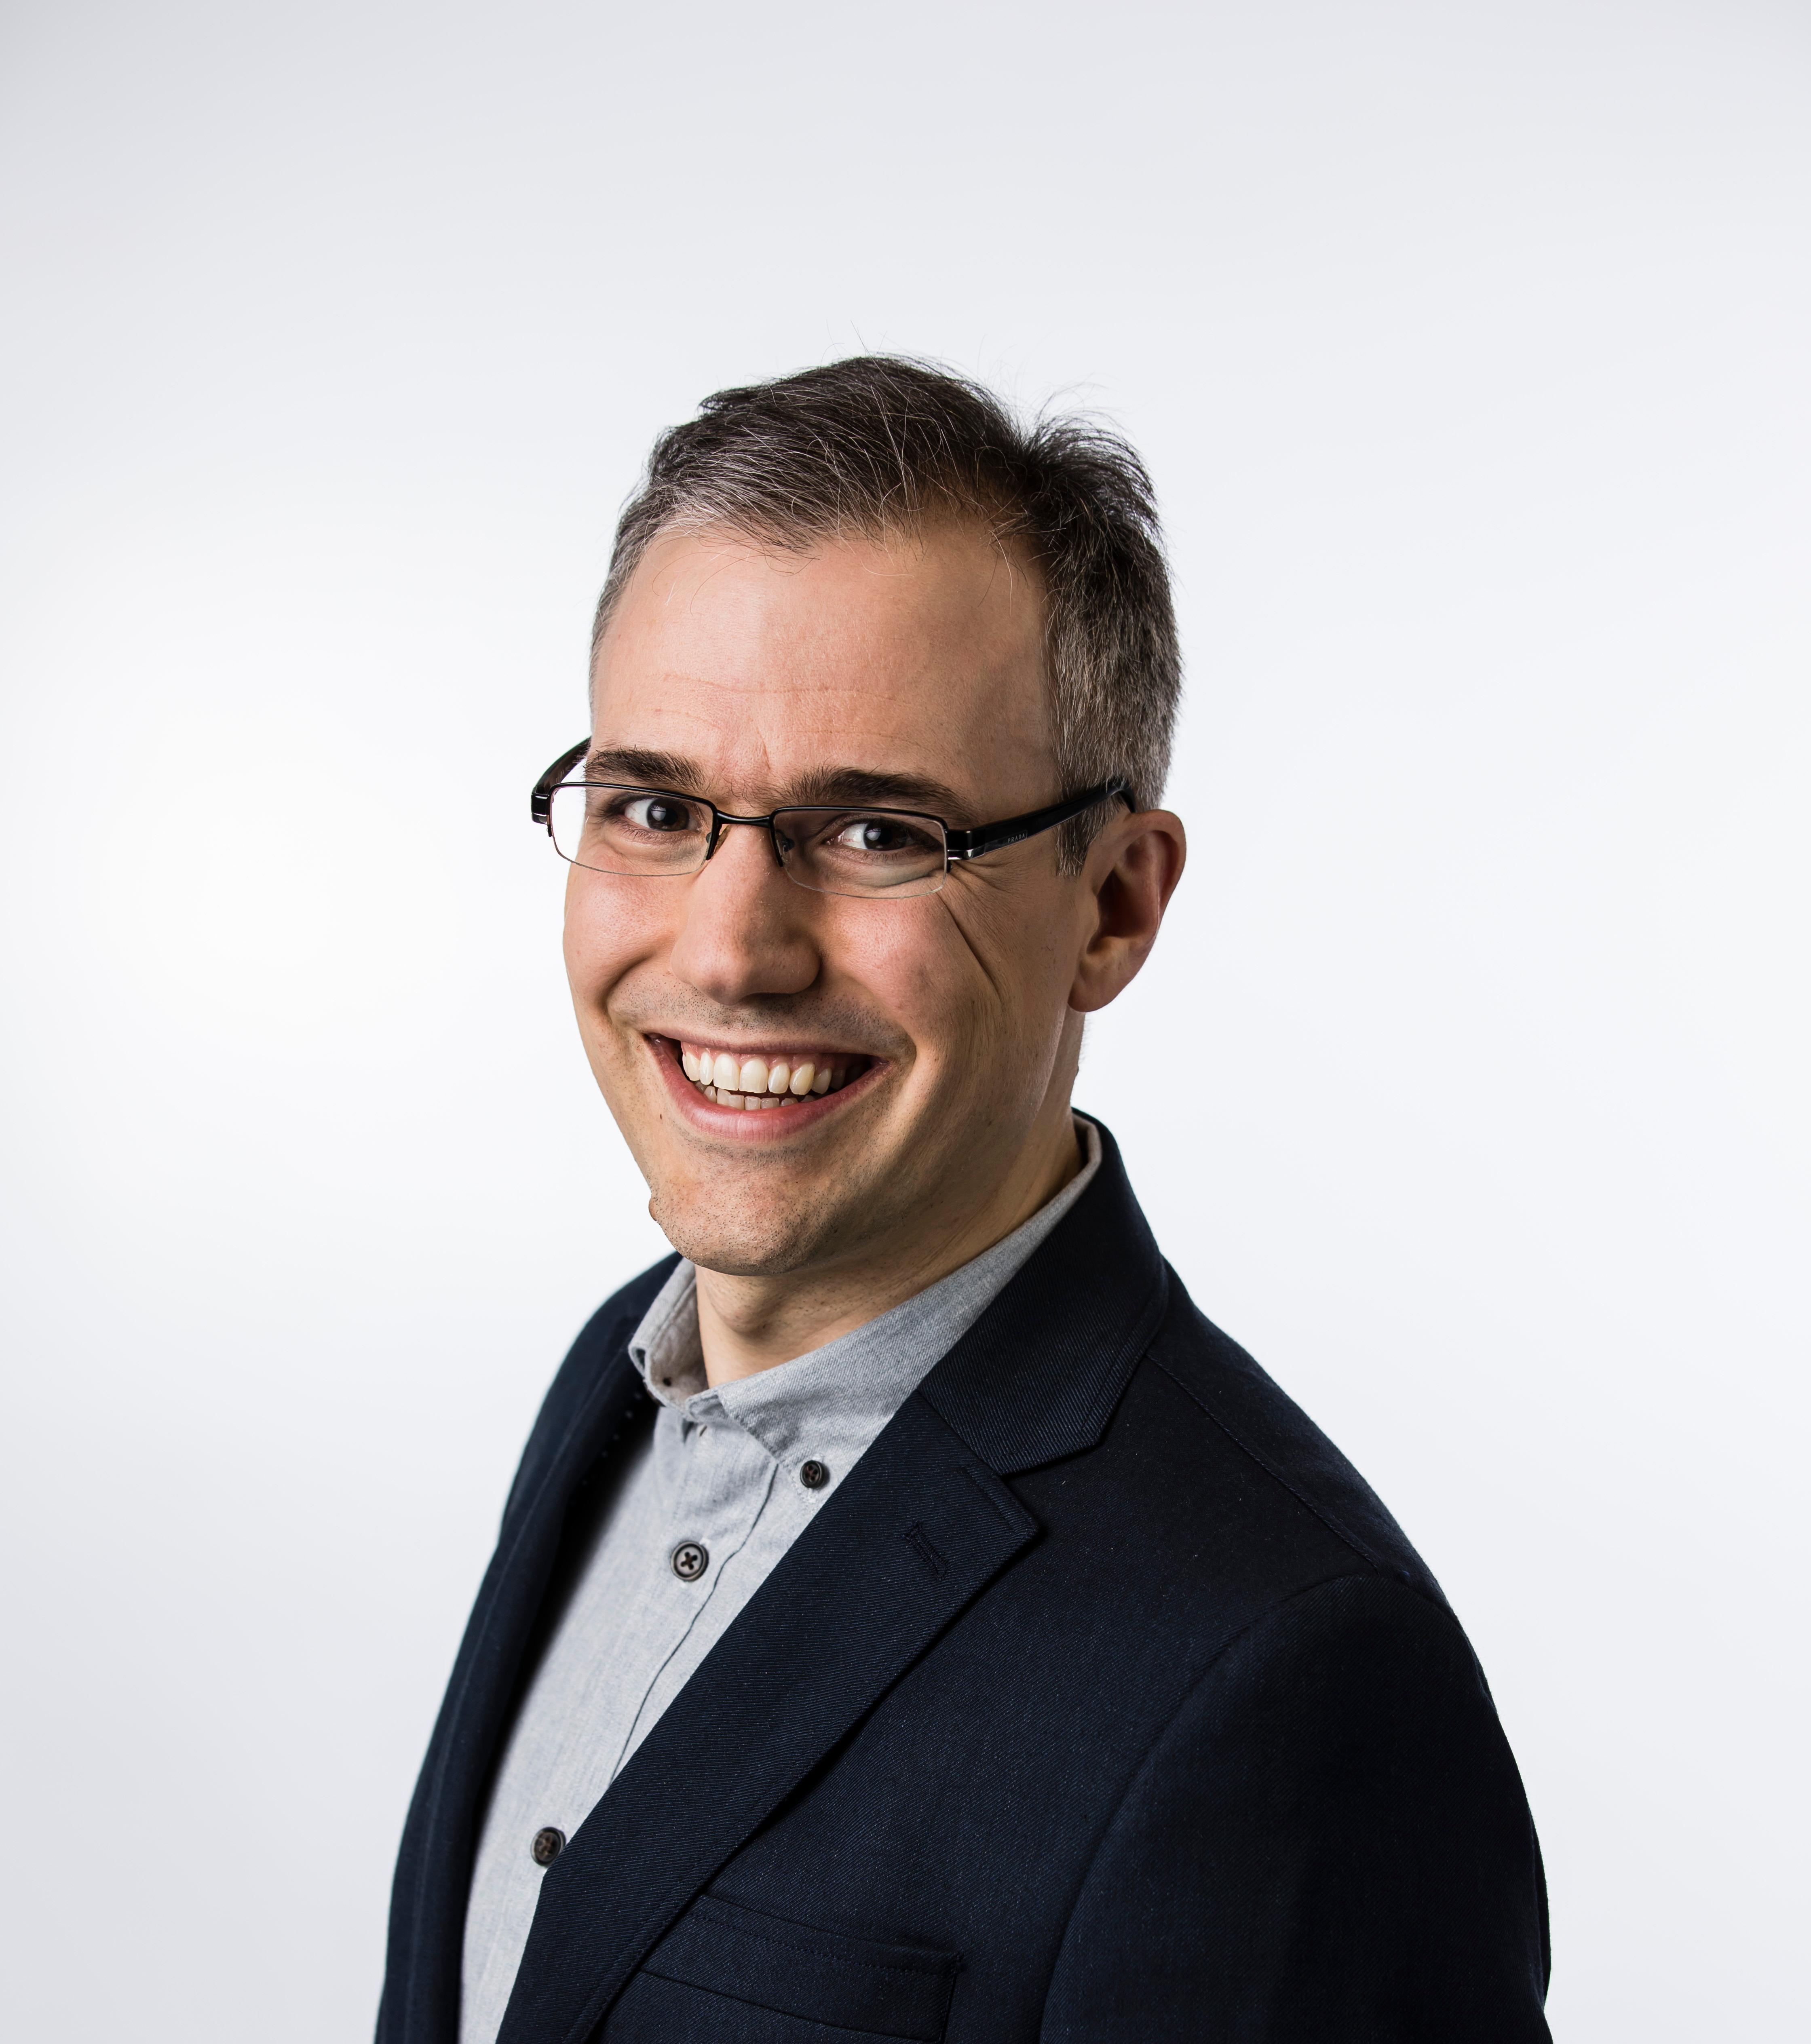 Håvard Graff;Principal Engineer